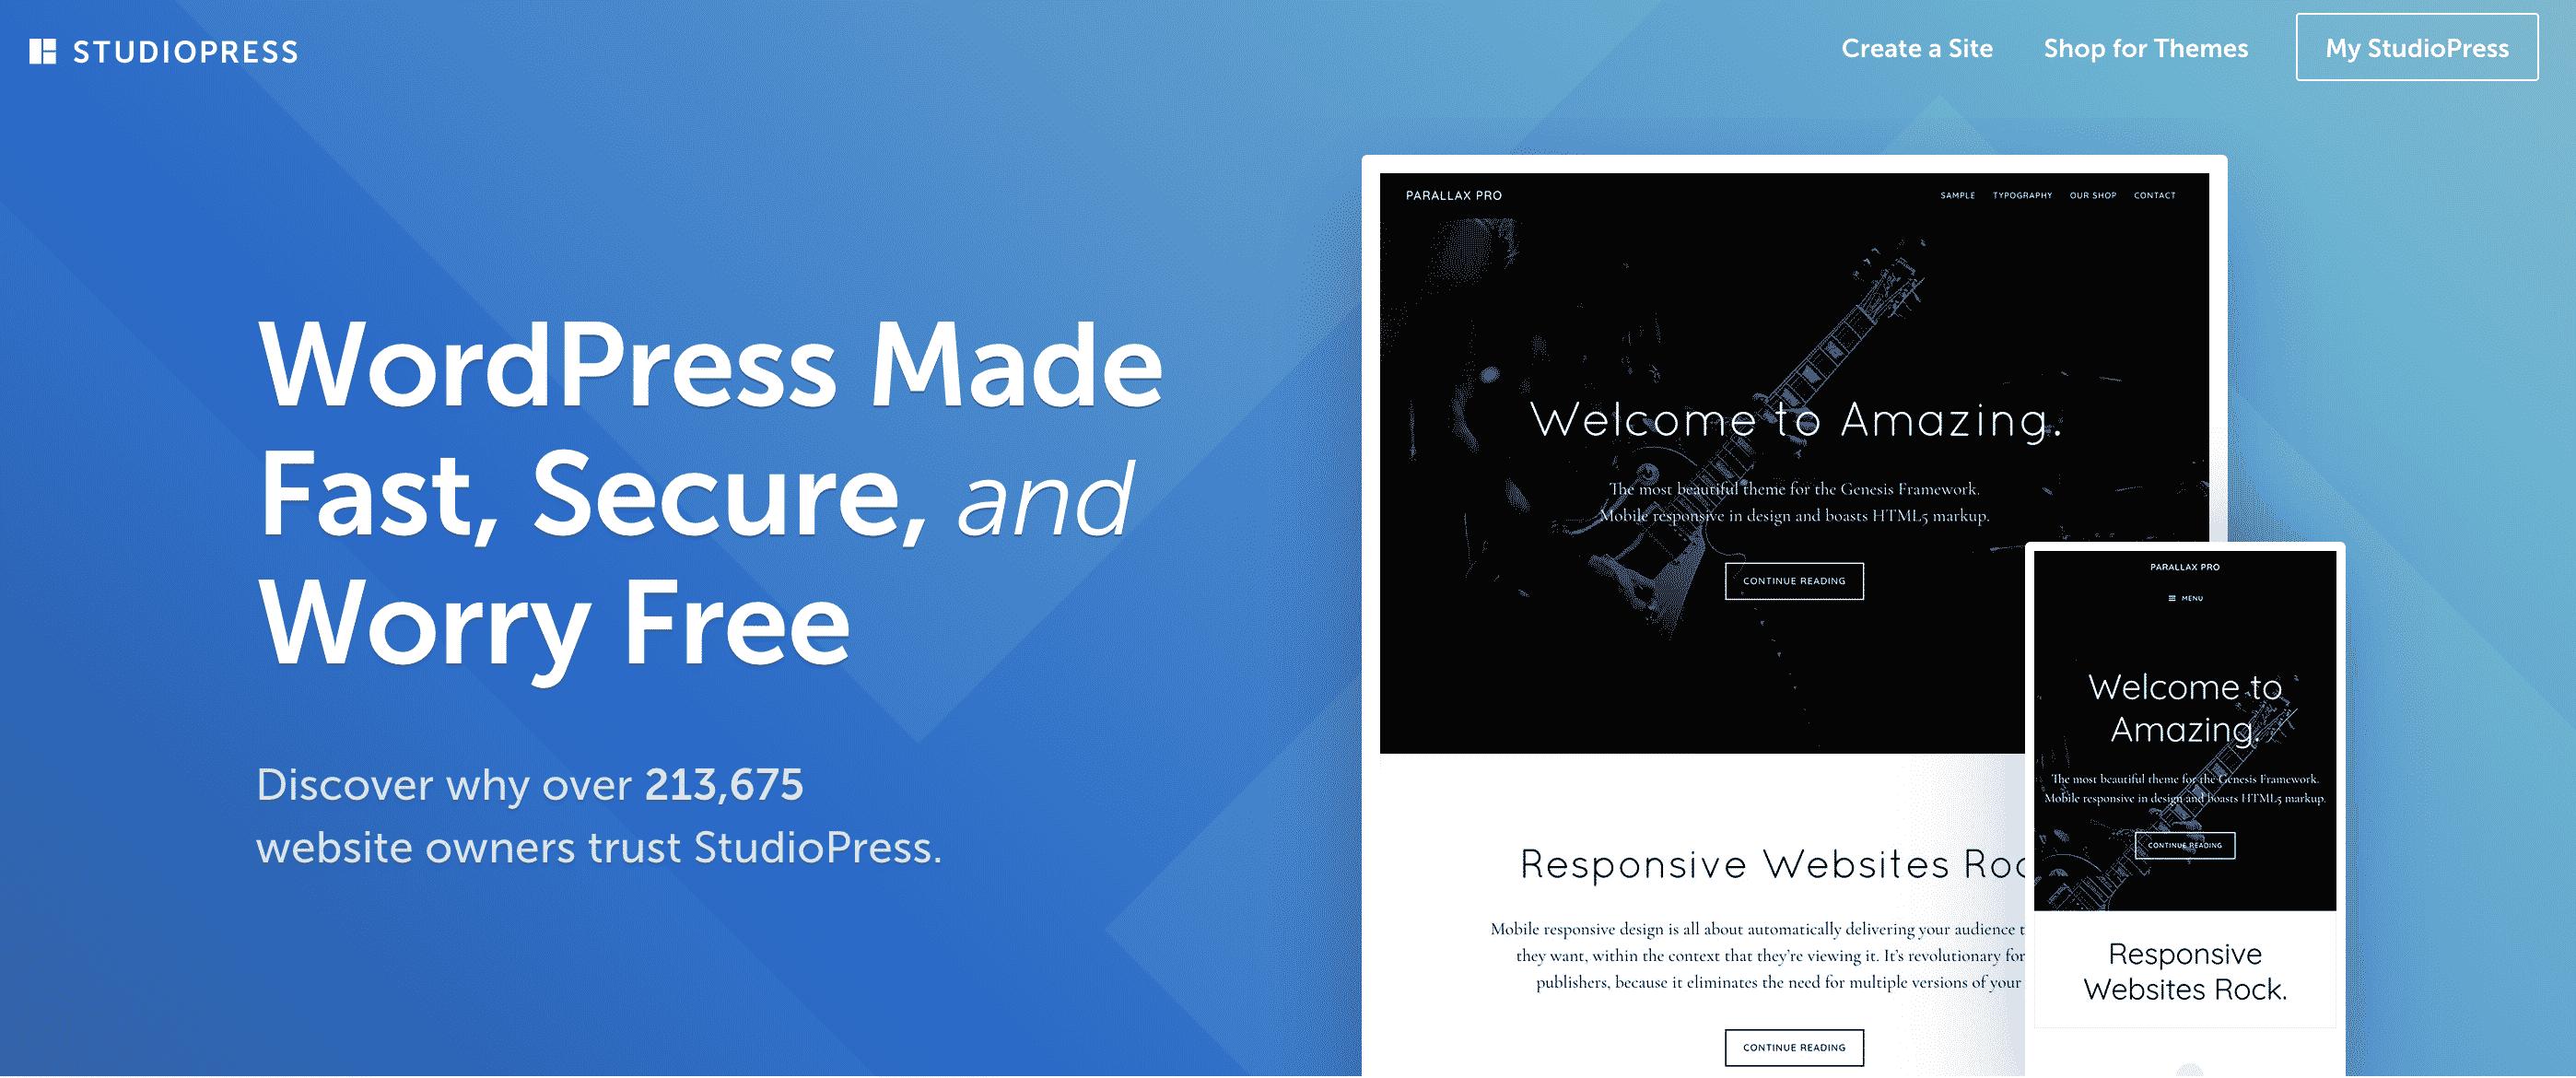 Studiopress Affiliate Marketing Website